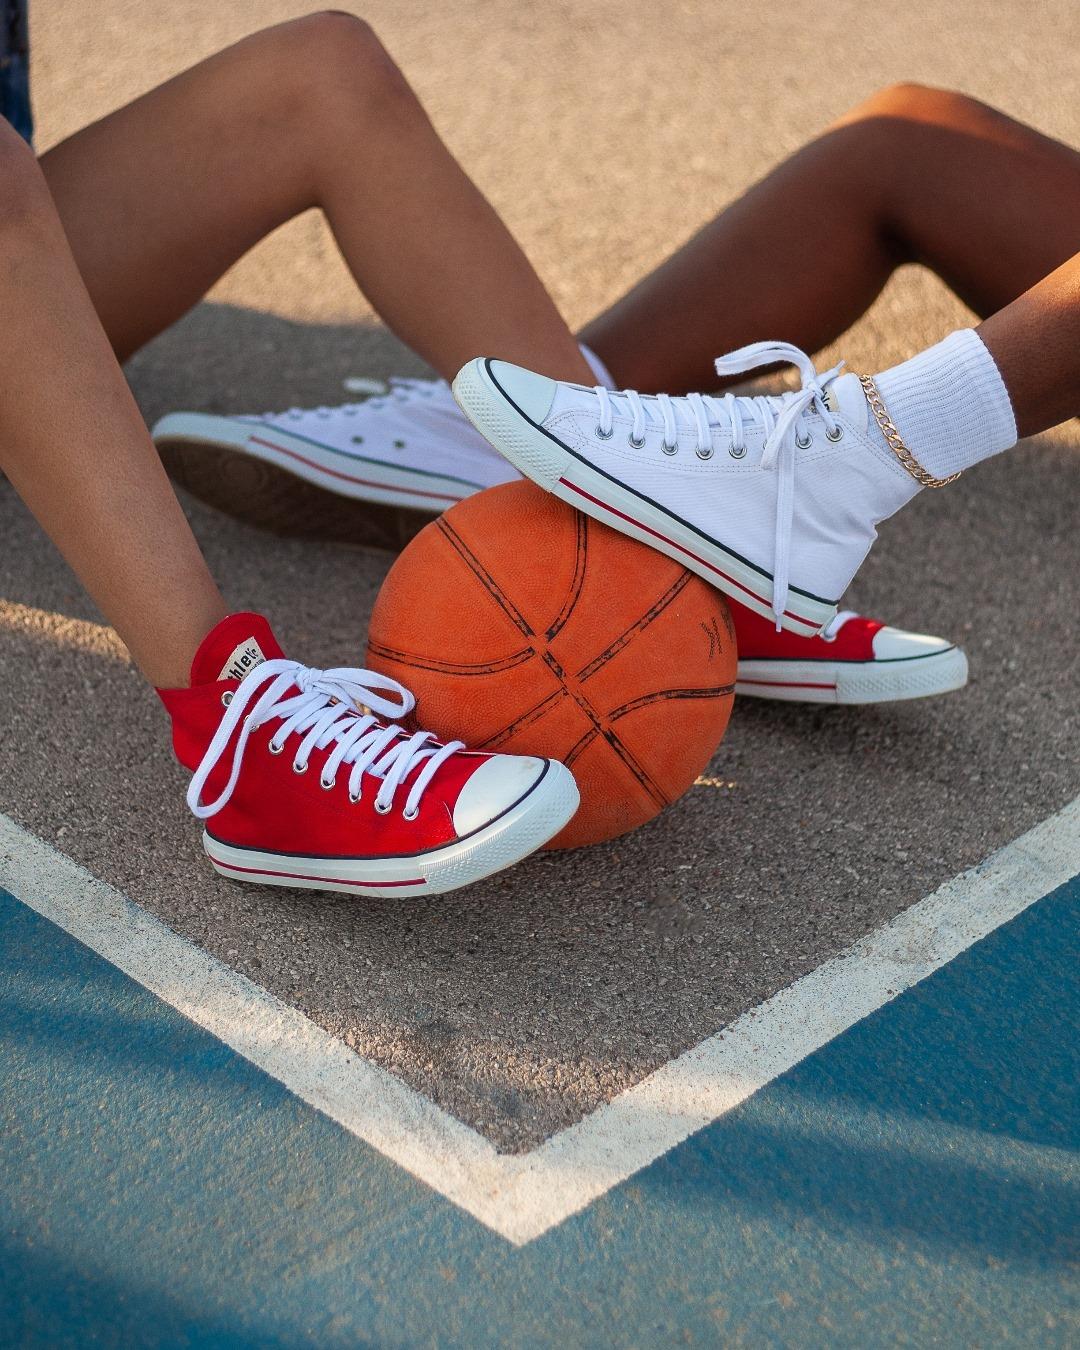 Vegan & Sustainable Shoe Brands - Ethletic